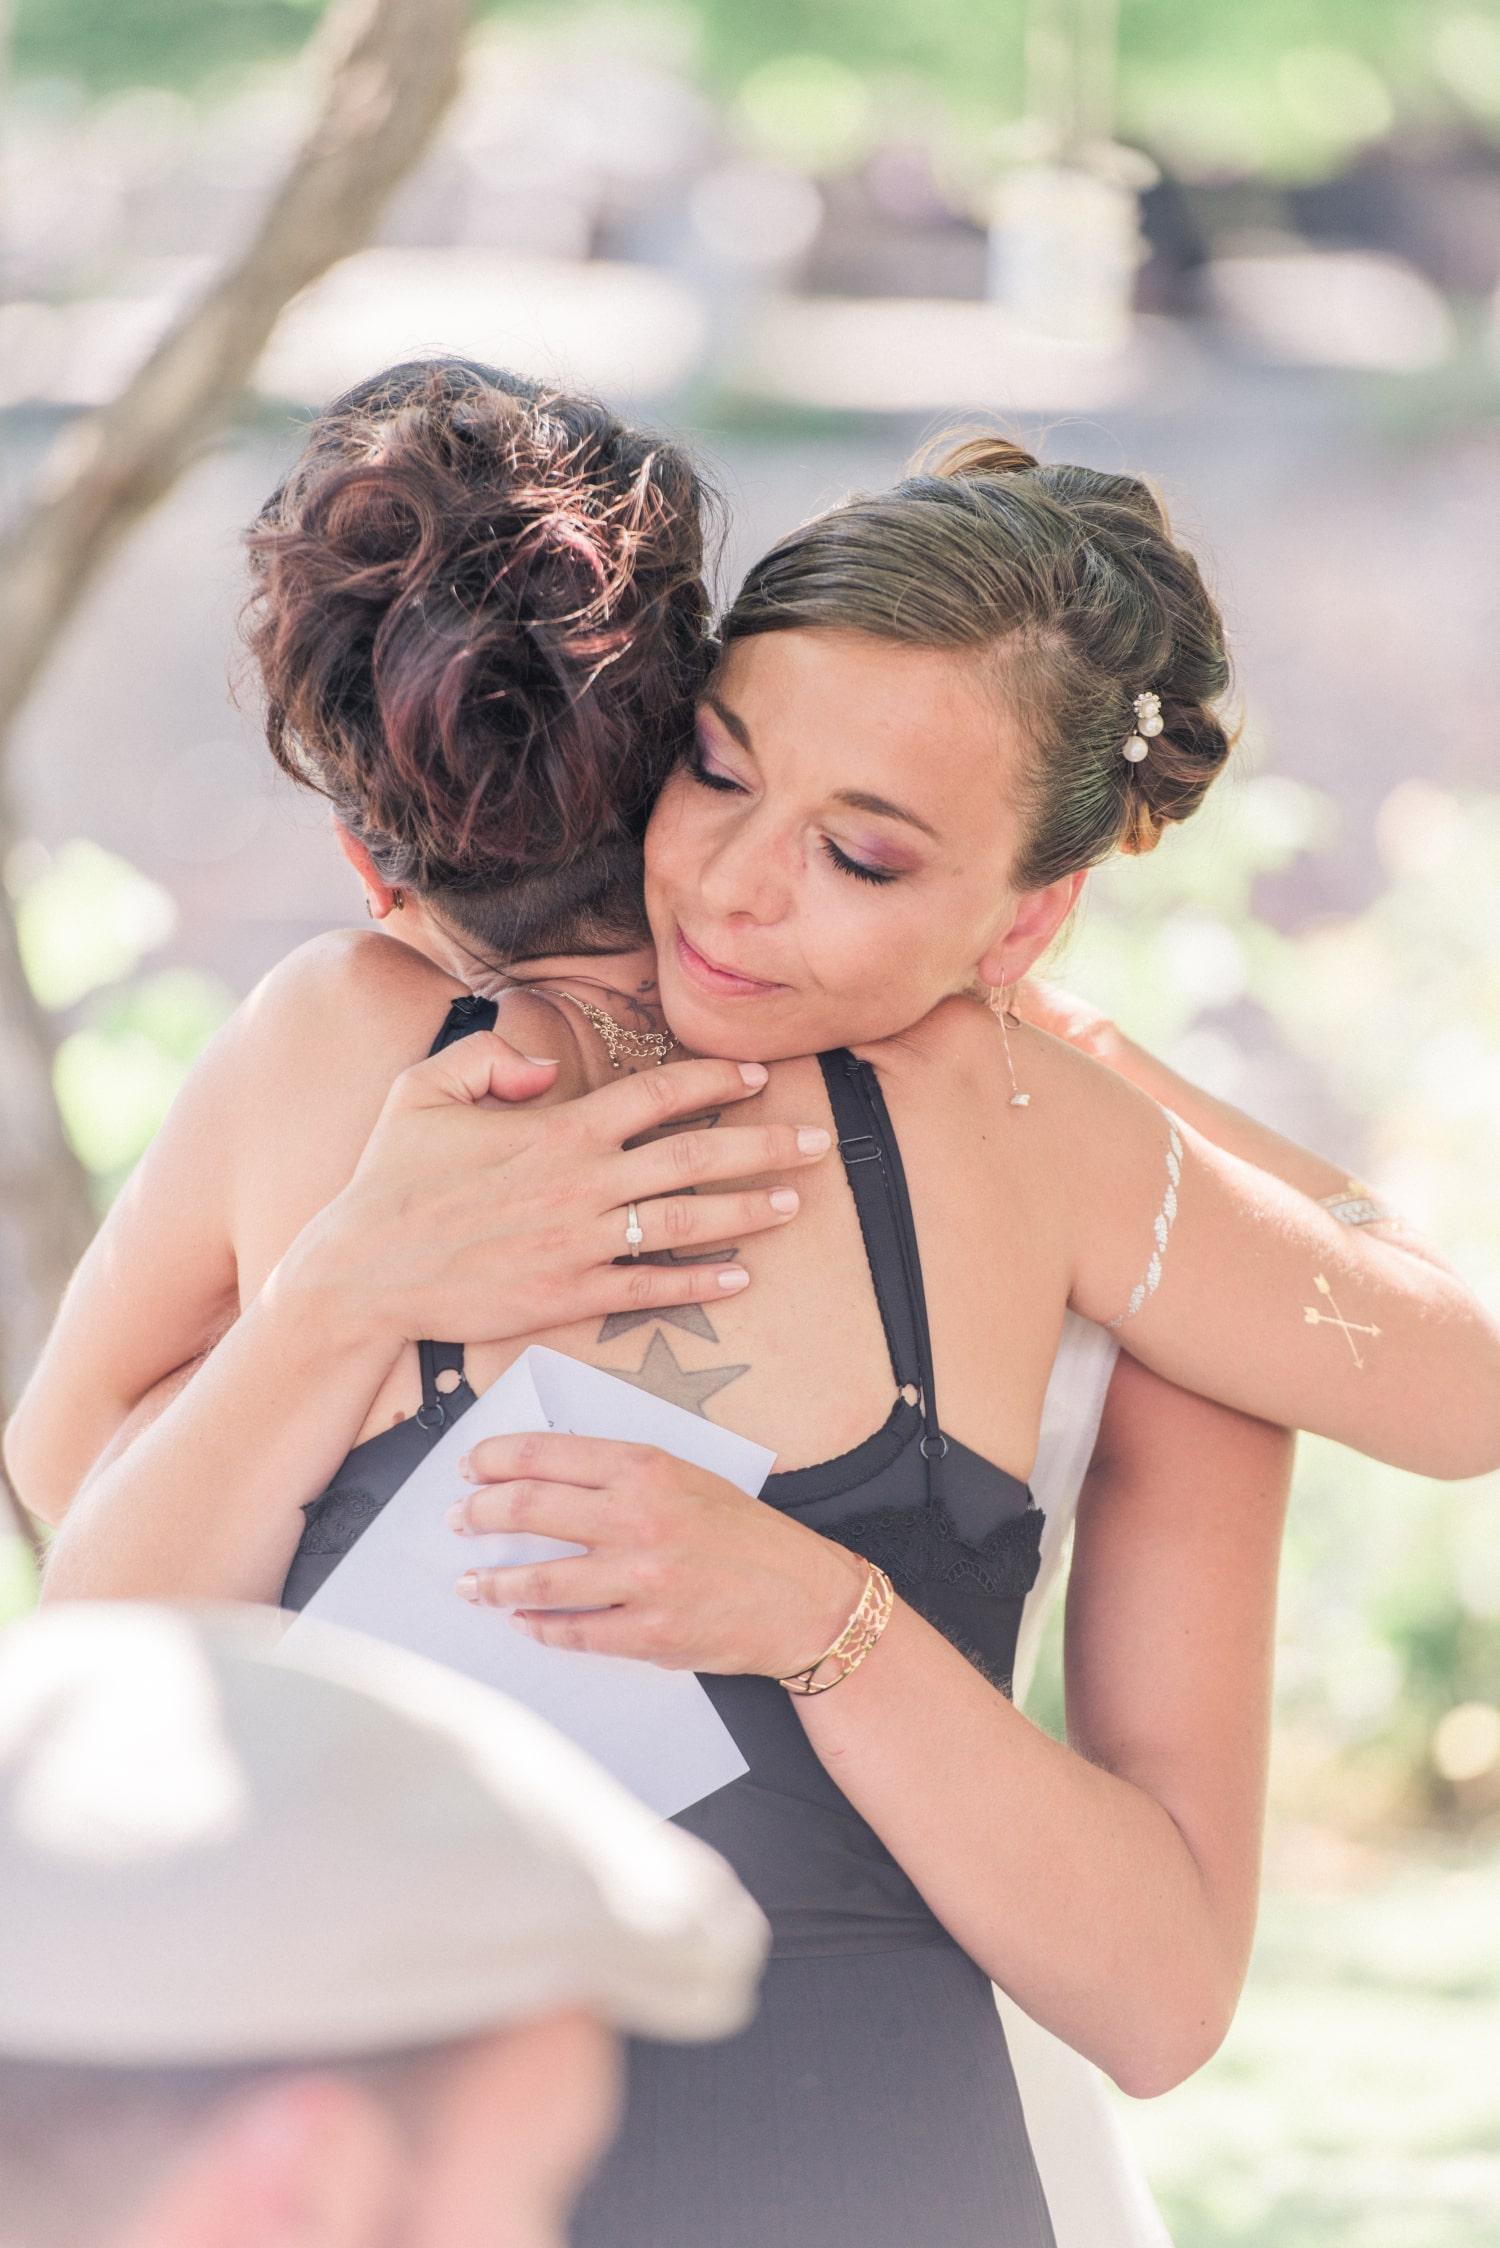 La mariée remercie sa témoin en la serrant dans ses bras